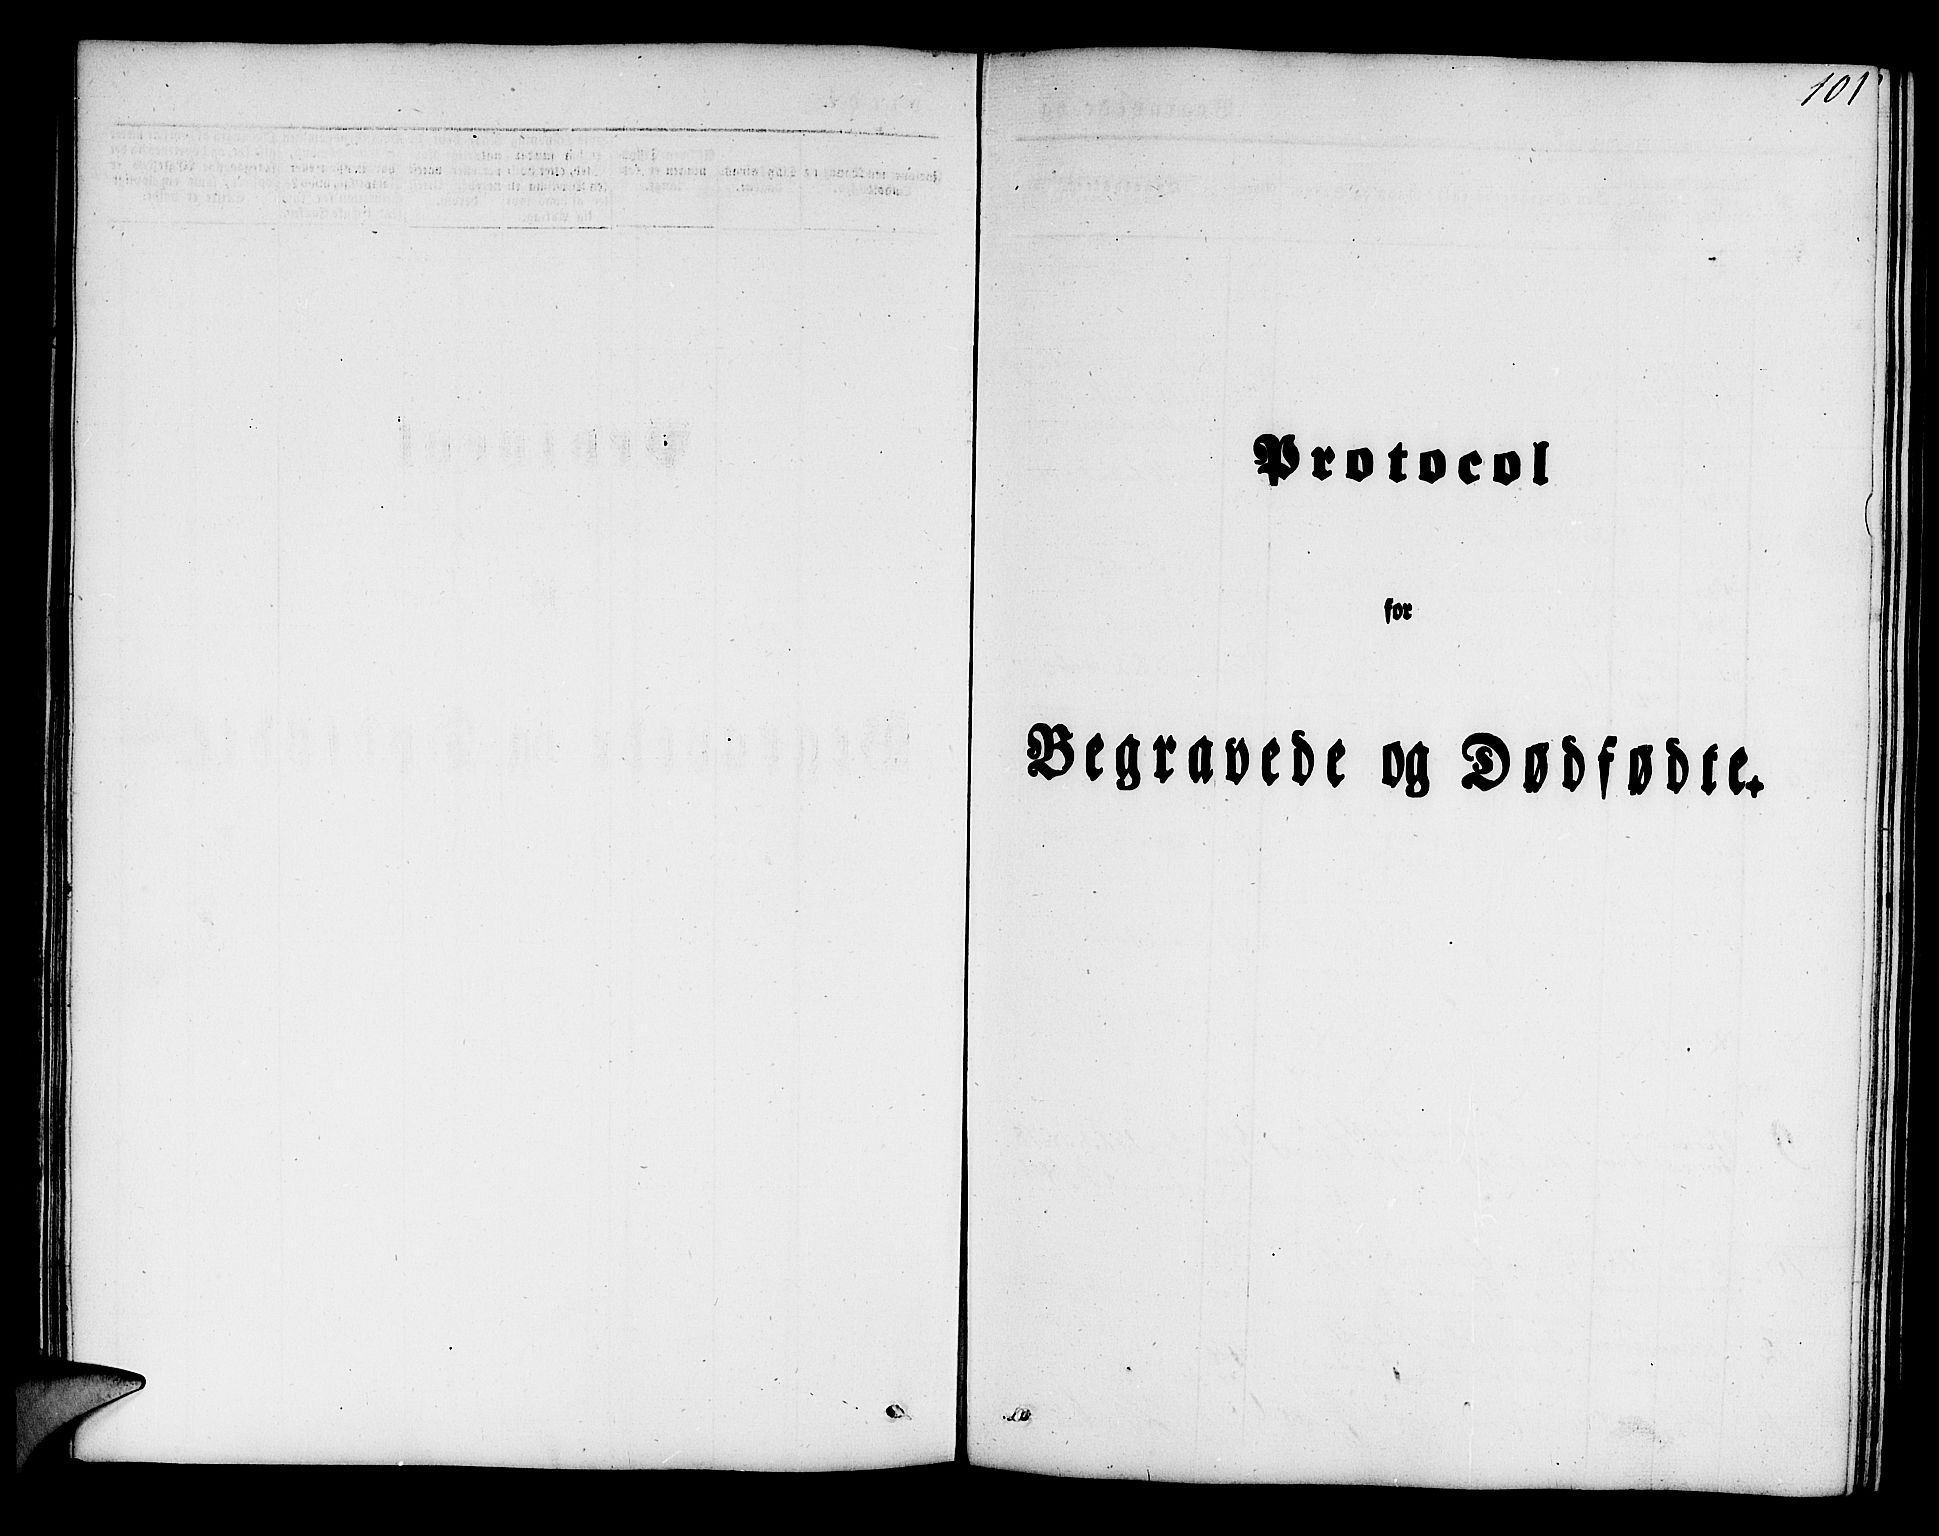 SAB, Mariakirken Sokneprestembete, H/Hab/L0002: Klokkerbok nr. A 2, 1846-1862, s. 101